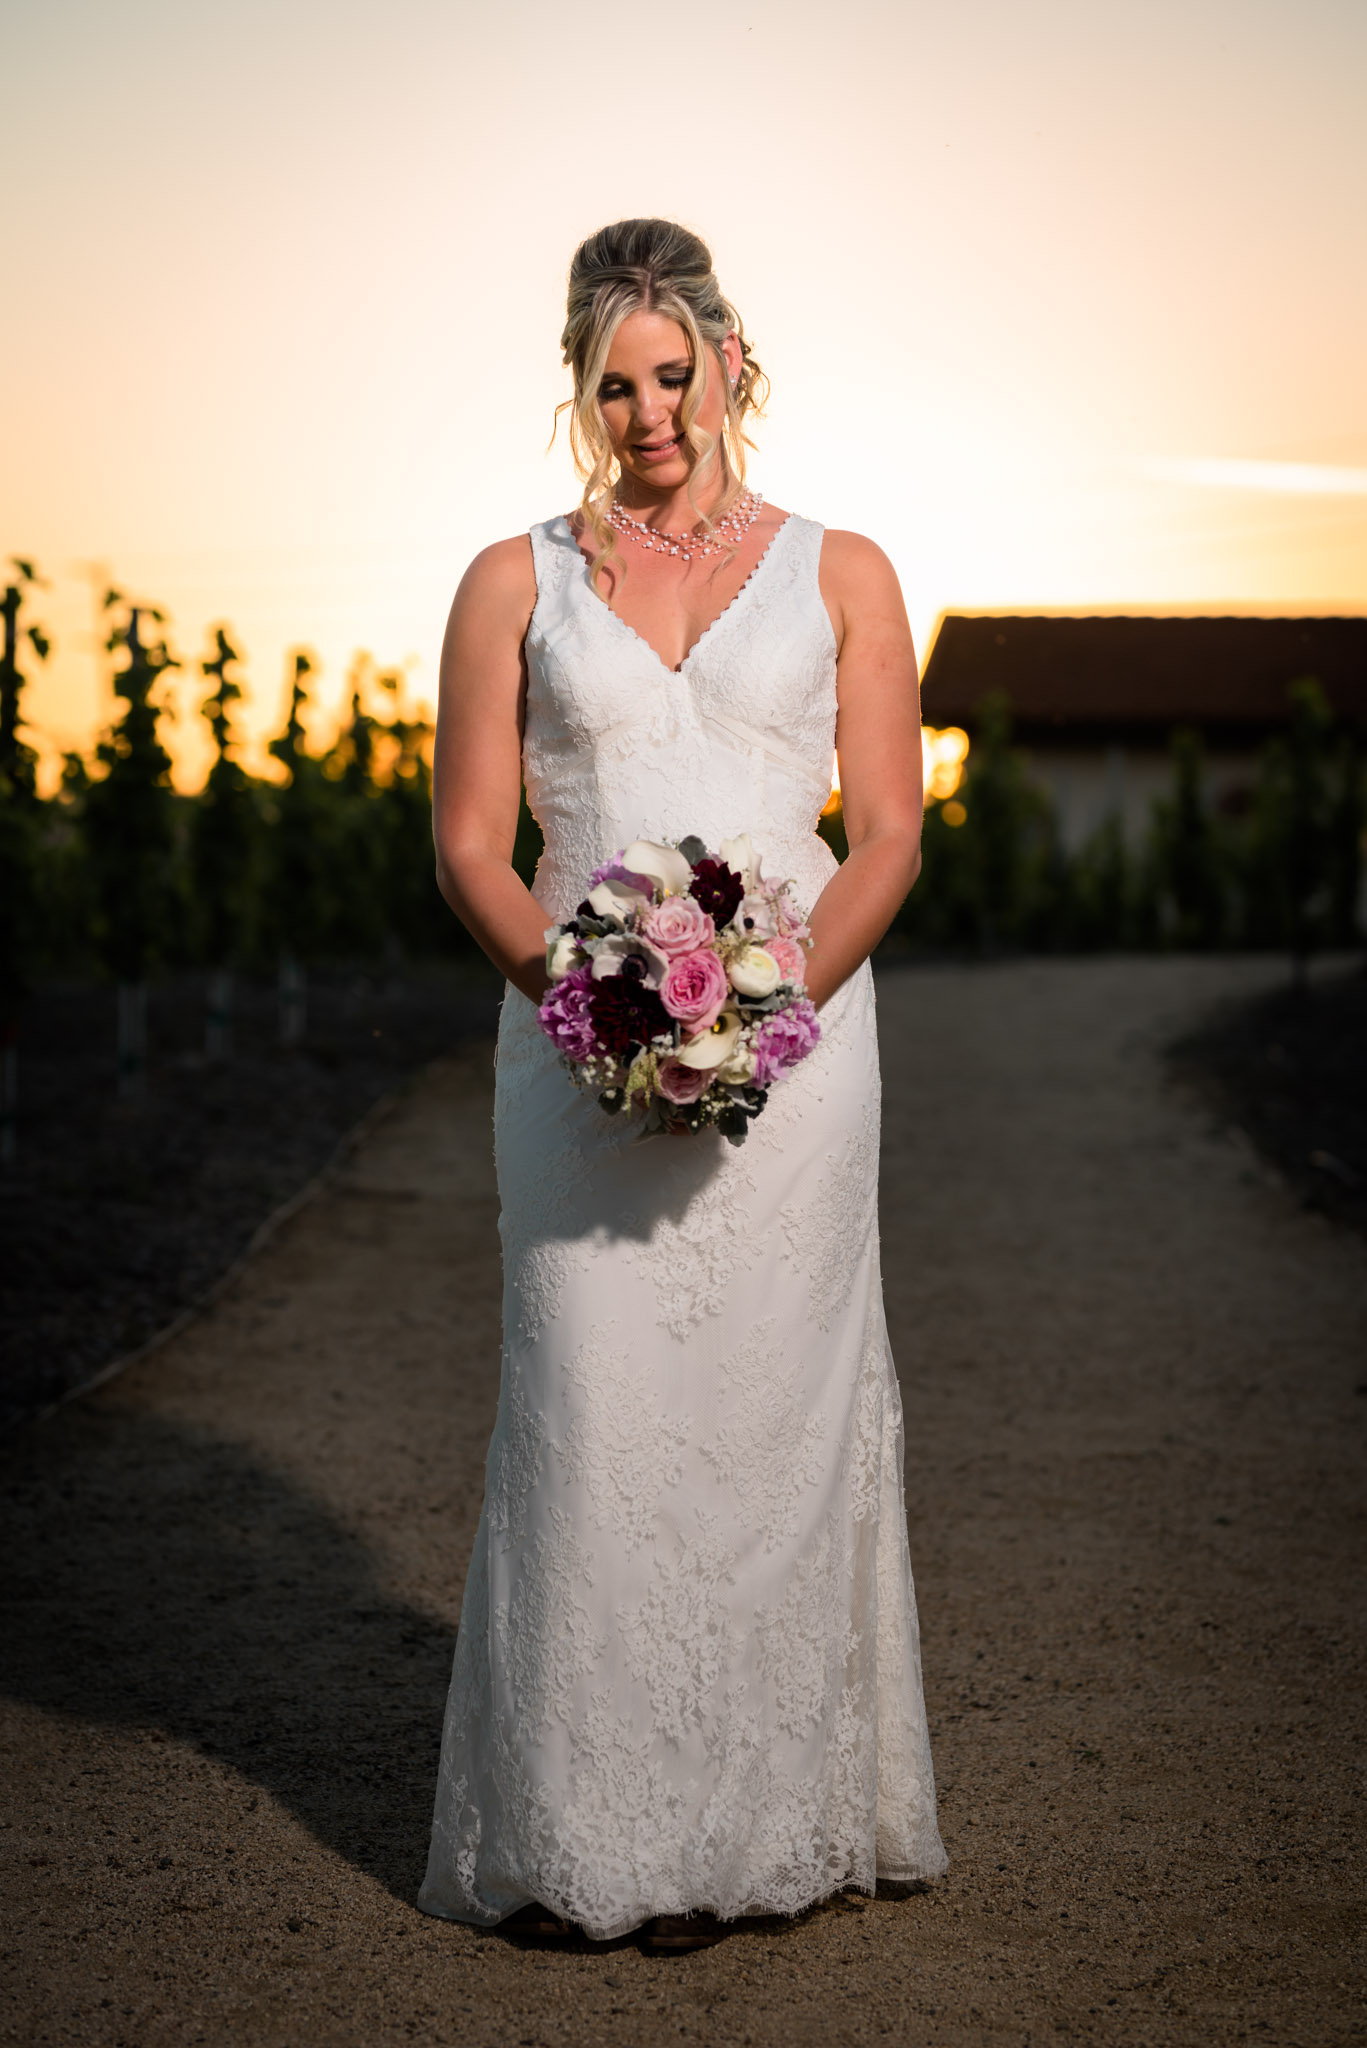 Avensole-Winery-Temecula-Wedding-Josh-and-Olivia-3813.JPG